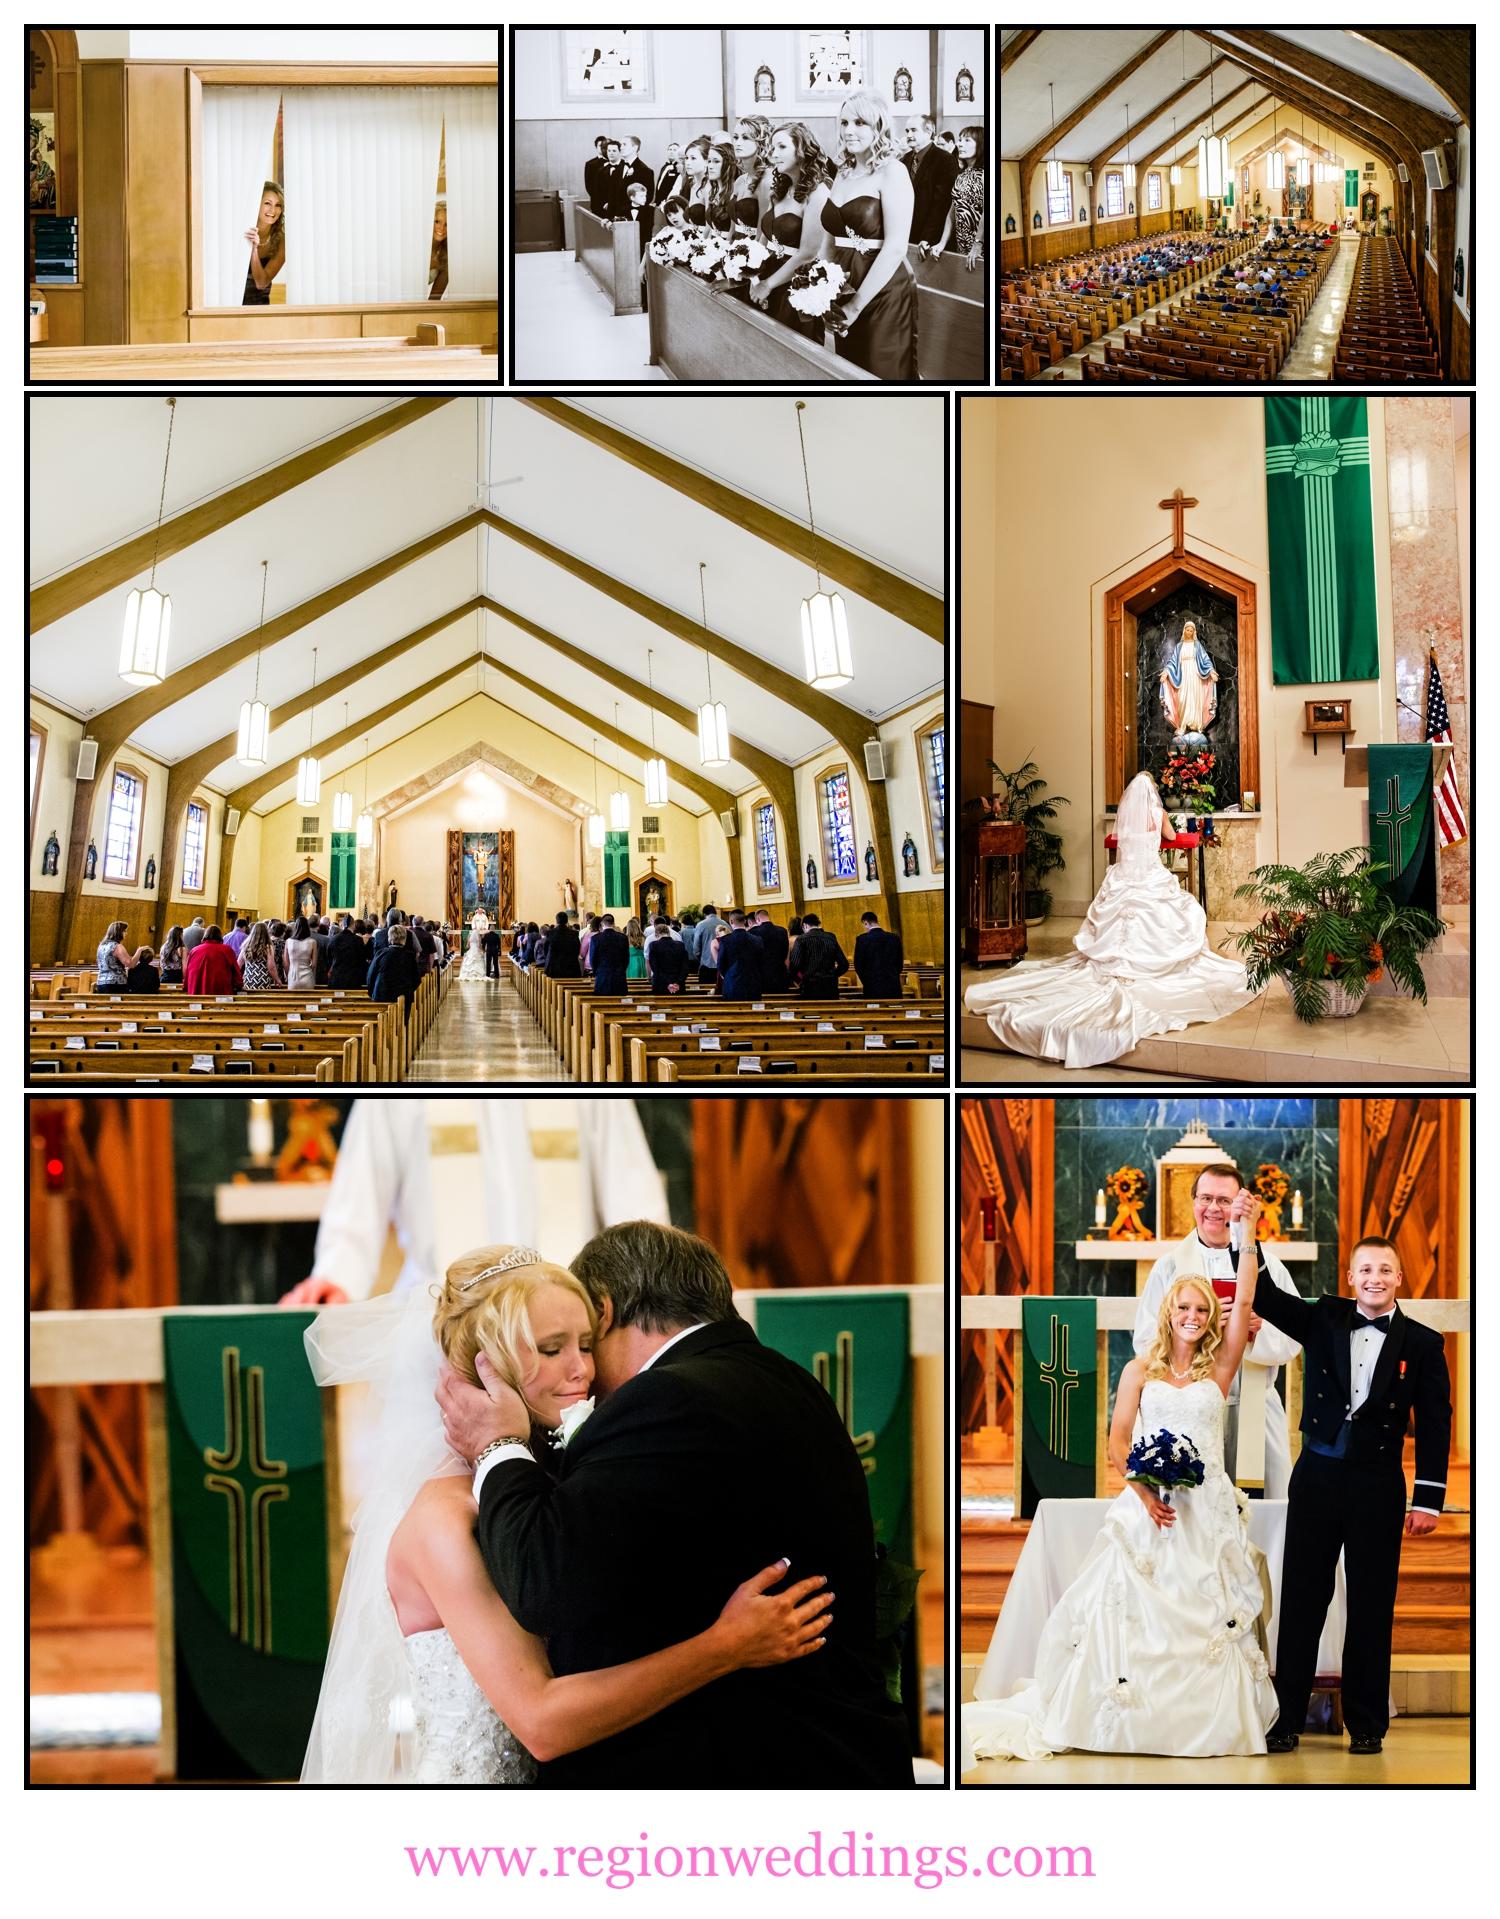 saint-mary-wedding-collage.jpg